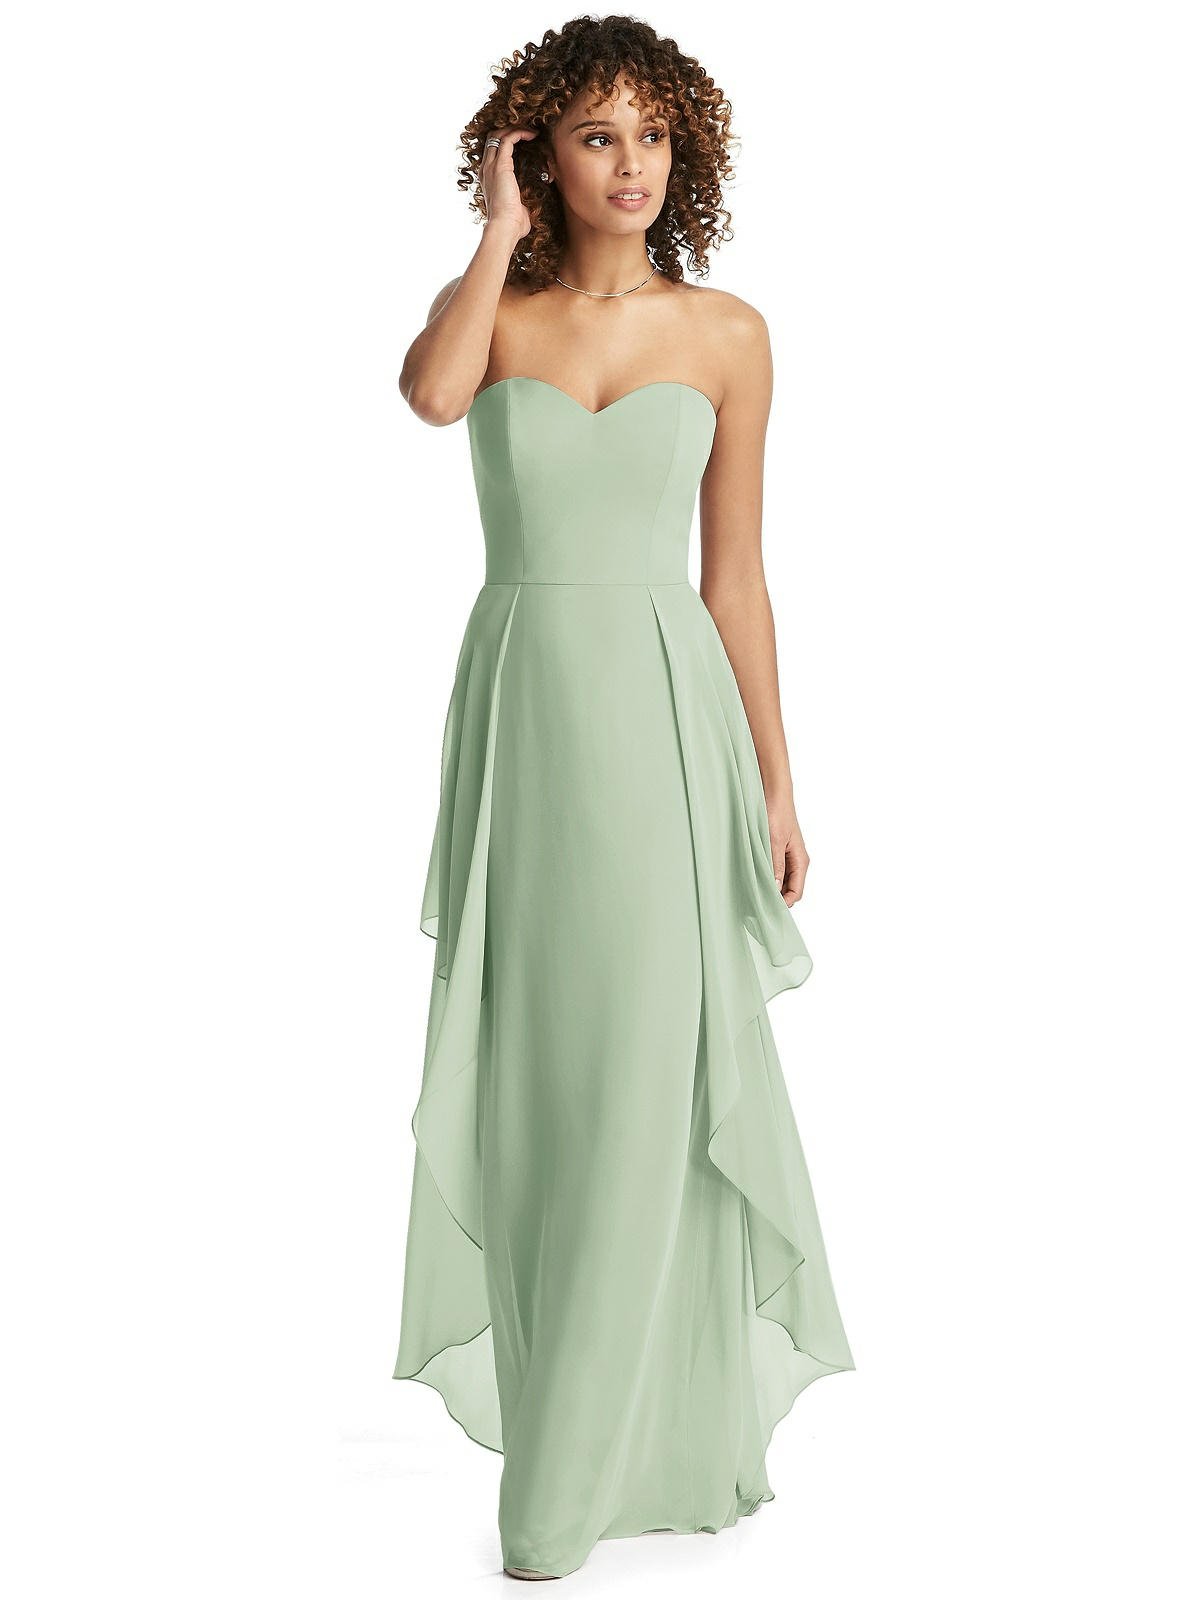 fall wedding bridesmaid dress celadon